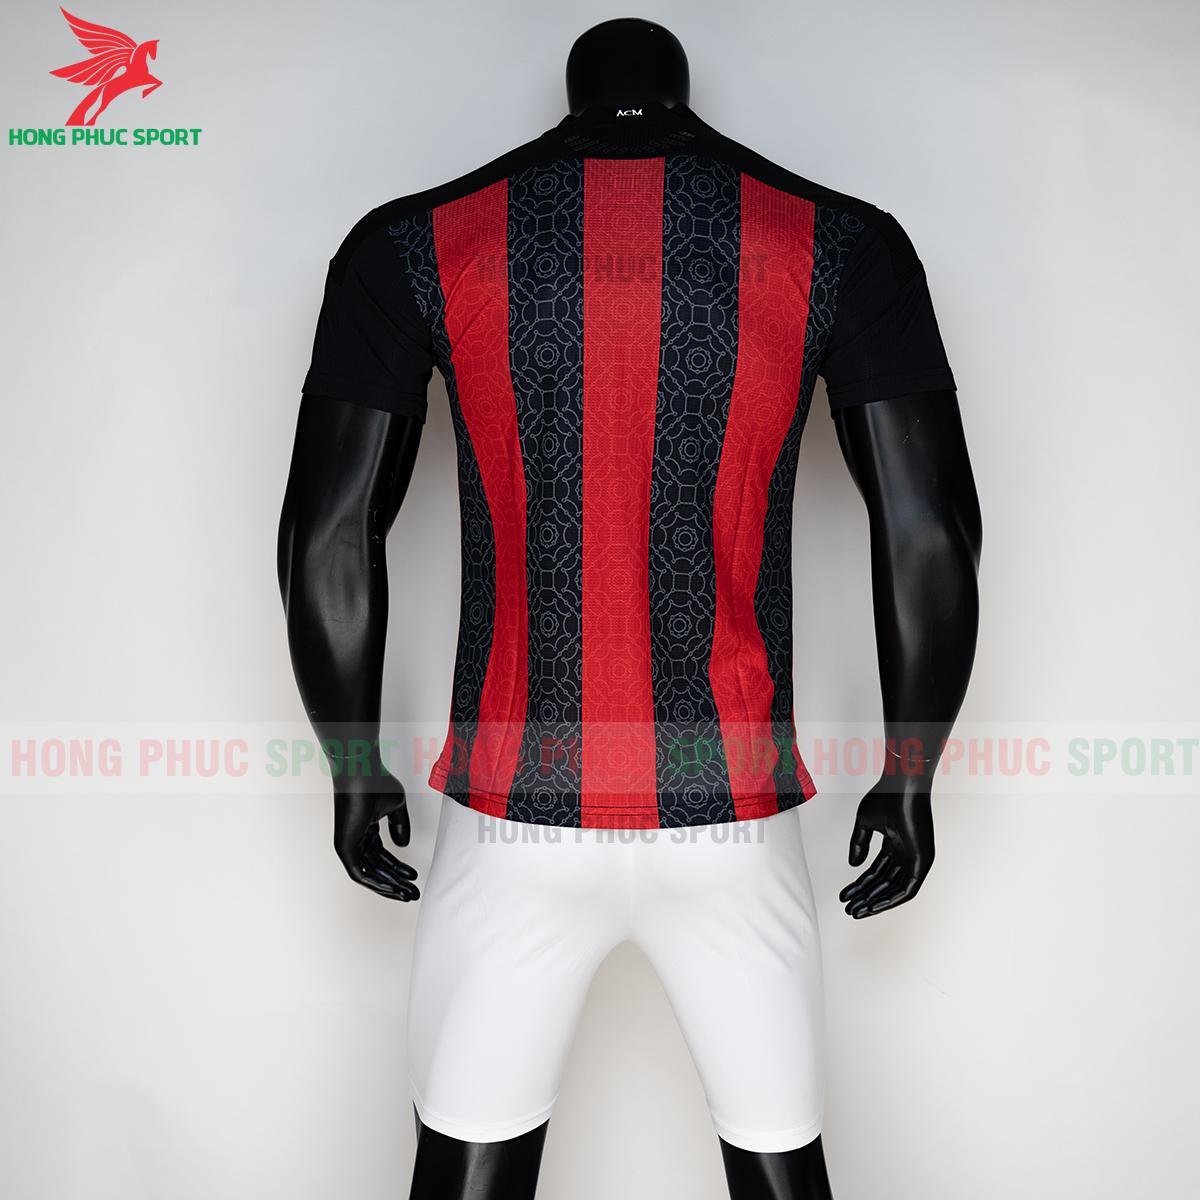 https://cdn.hongphucsport.com/unsafe/s4.shopbay.vn/files/285/ao-ac-milan-2020-san-nha-7-5f73e1083e115.png